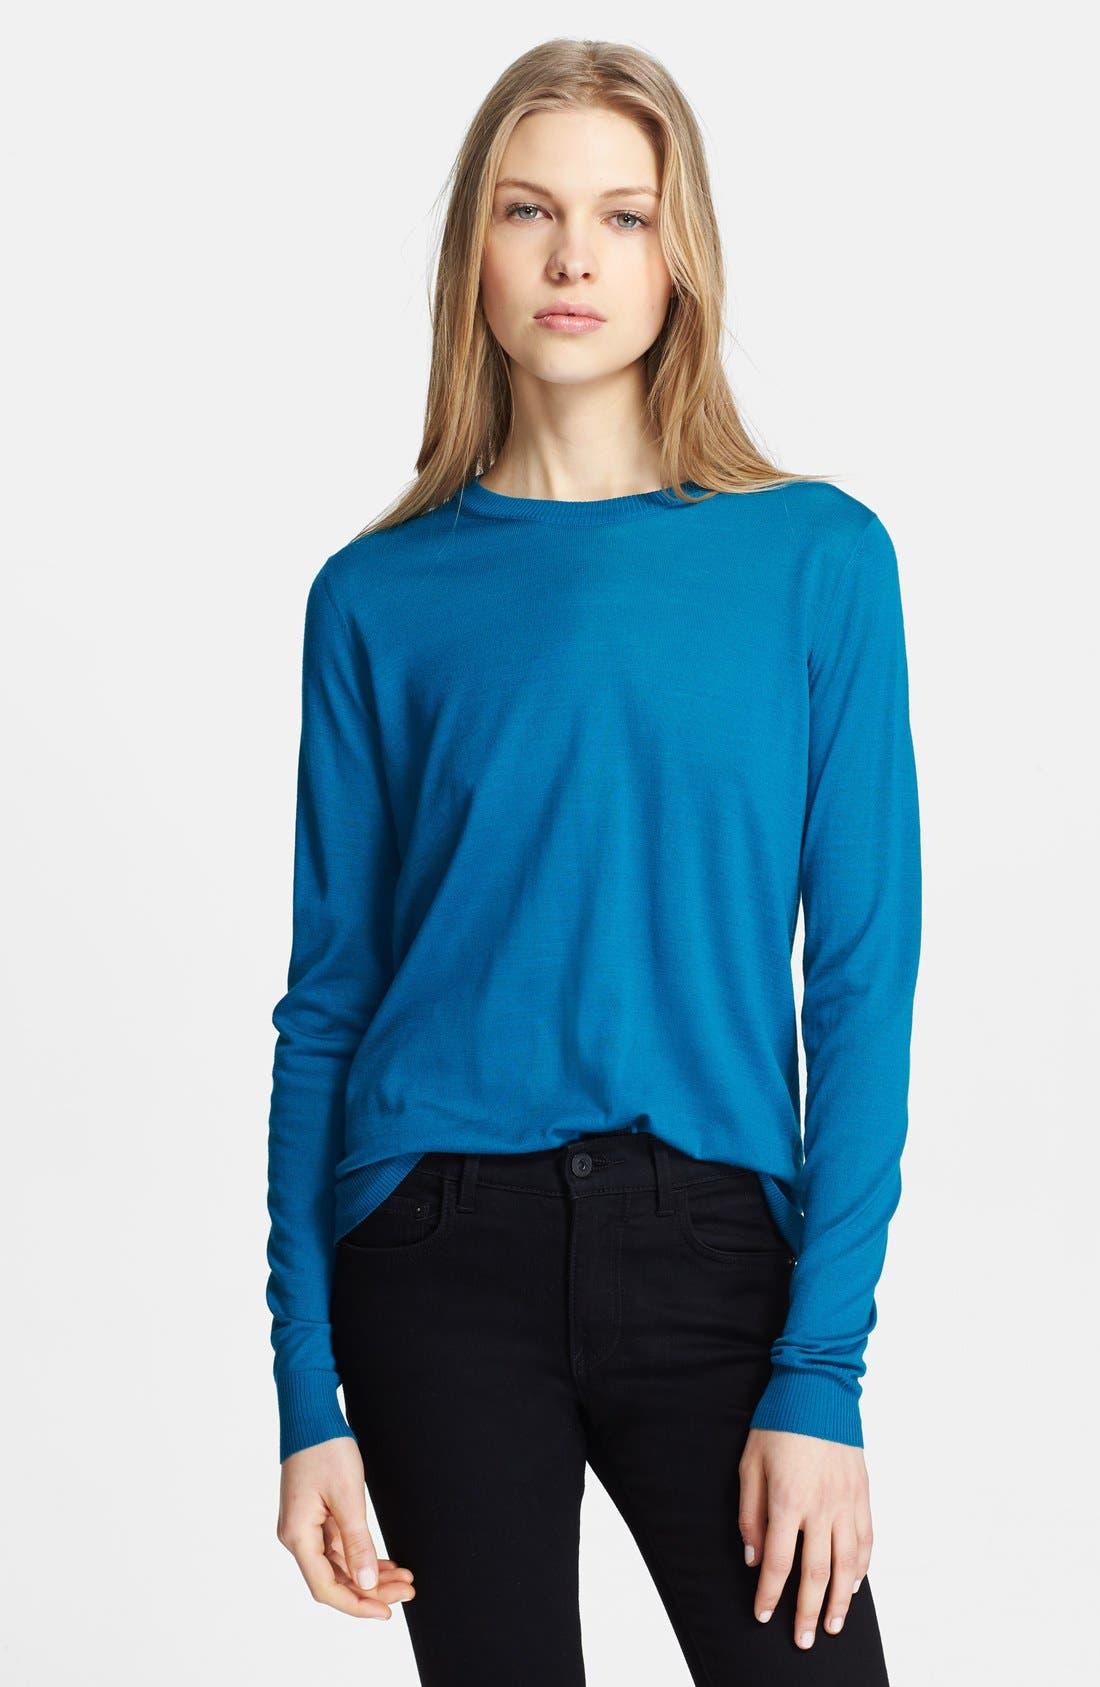 Alternate Image 1 Selected - Proenza Schouler Superfine Merino Wool Sweater